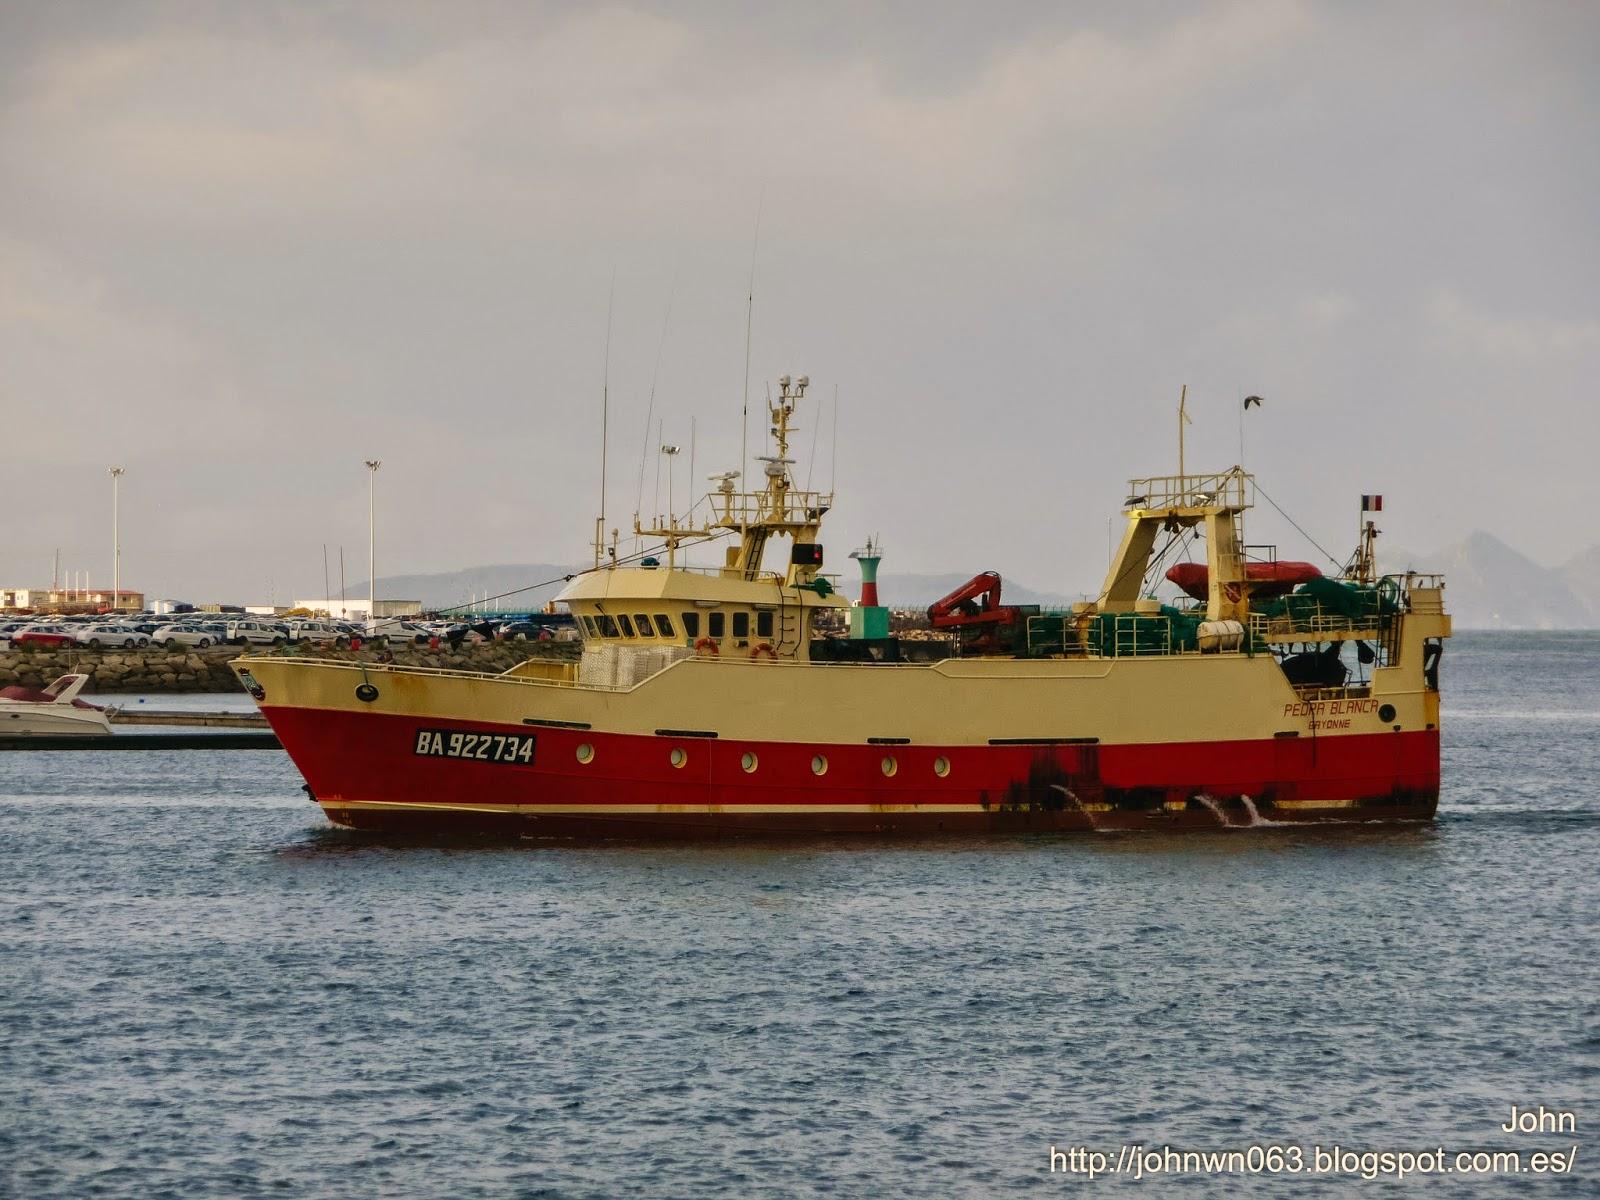 fotos de barcos, imagenes de barcos, pedra blanca, astilleros armada, pesquero, vigo